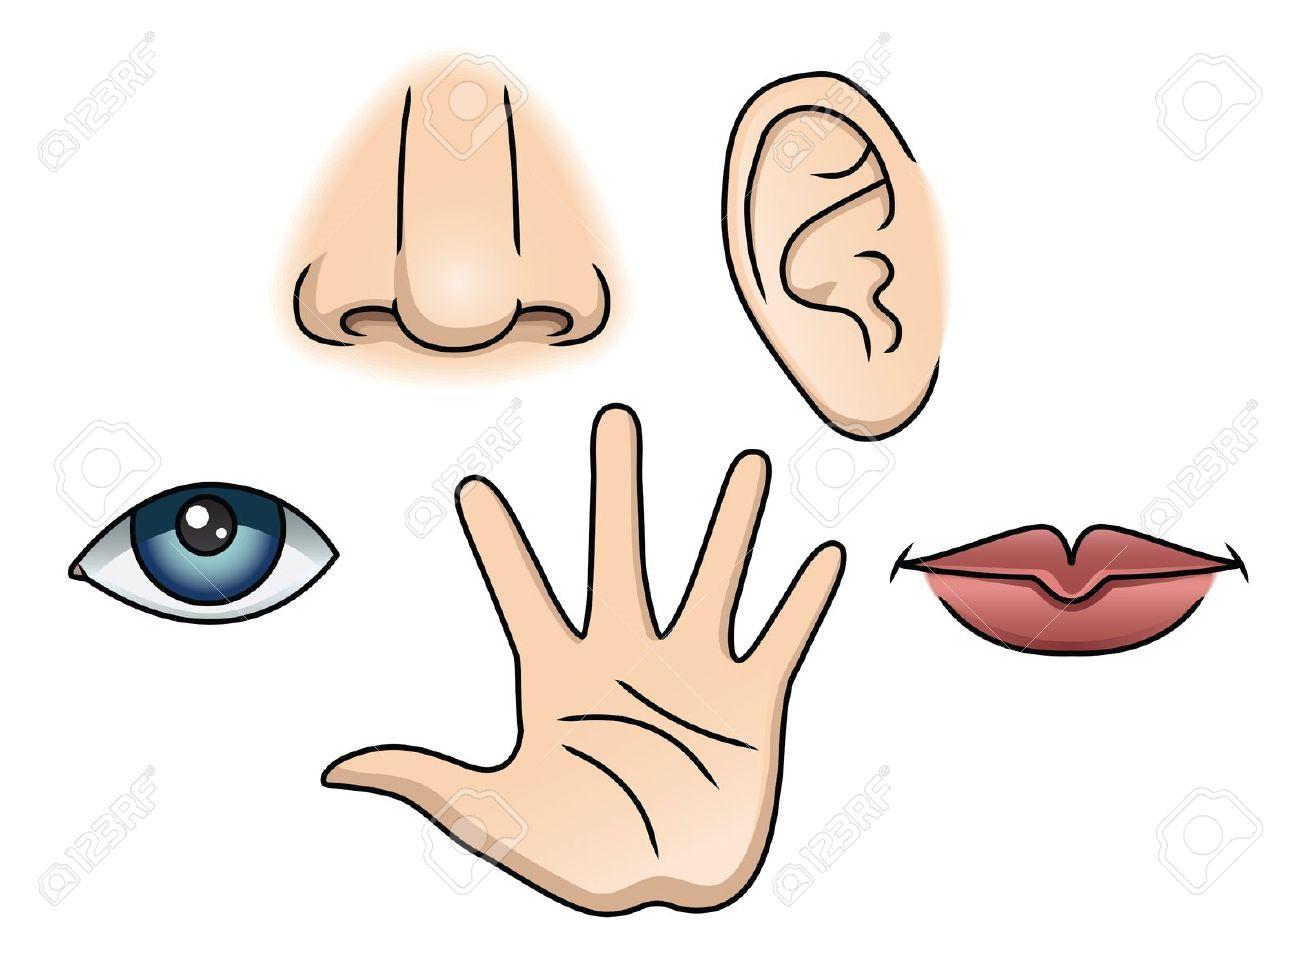 5 senses clipart, 5 senses Transparent FREE for download on.